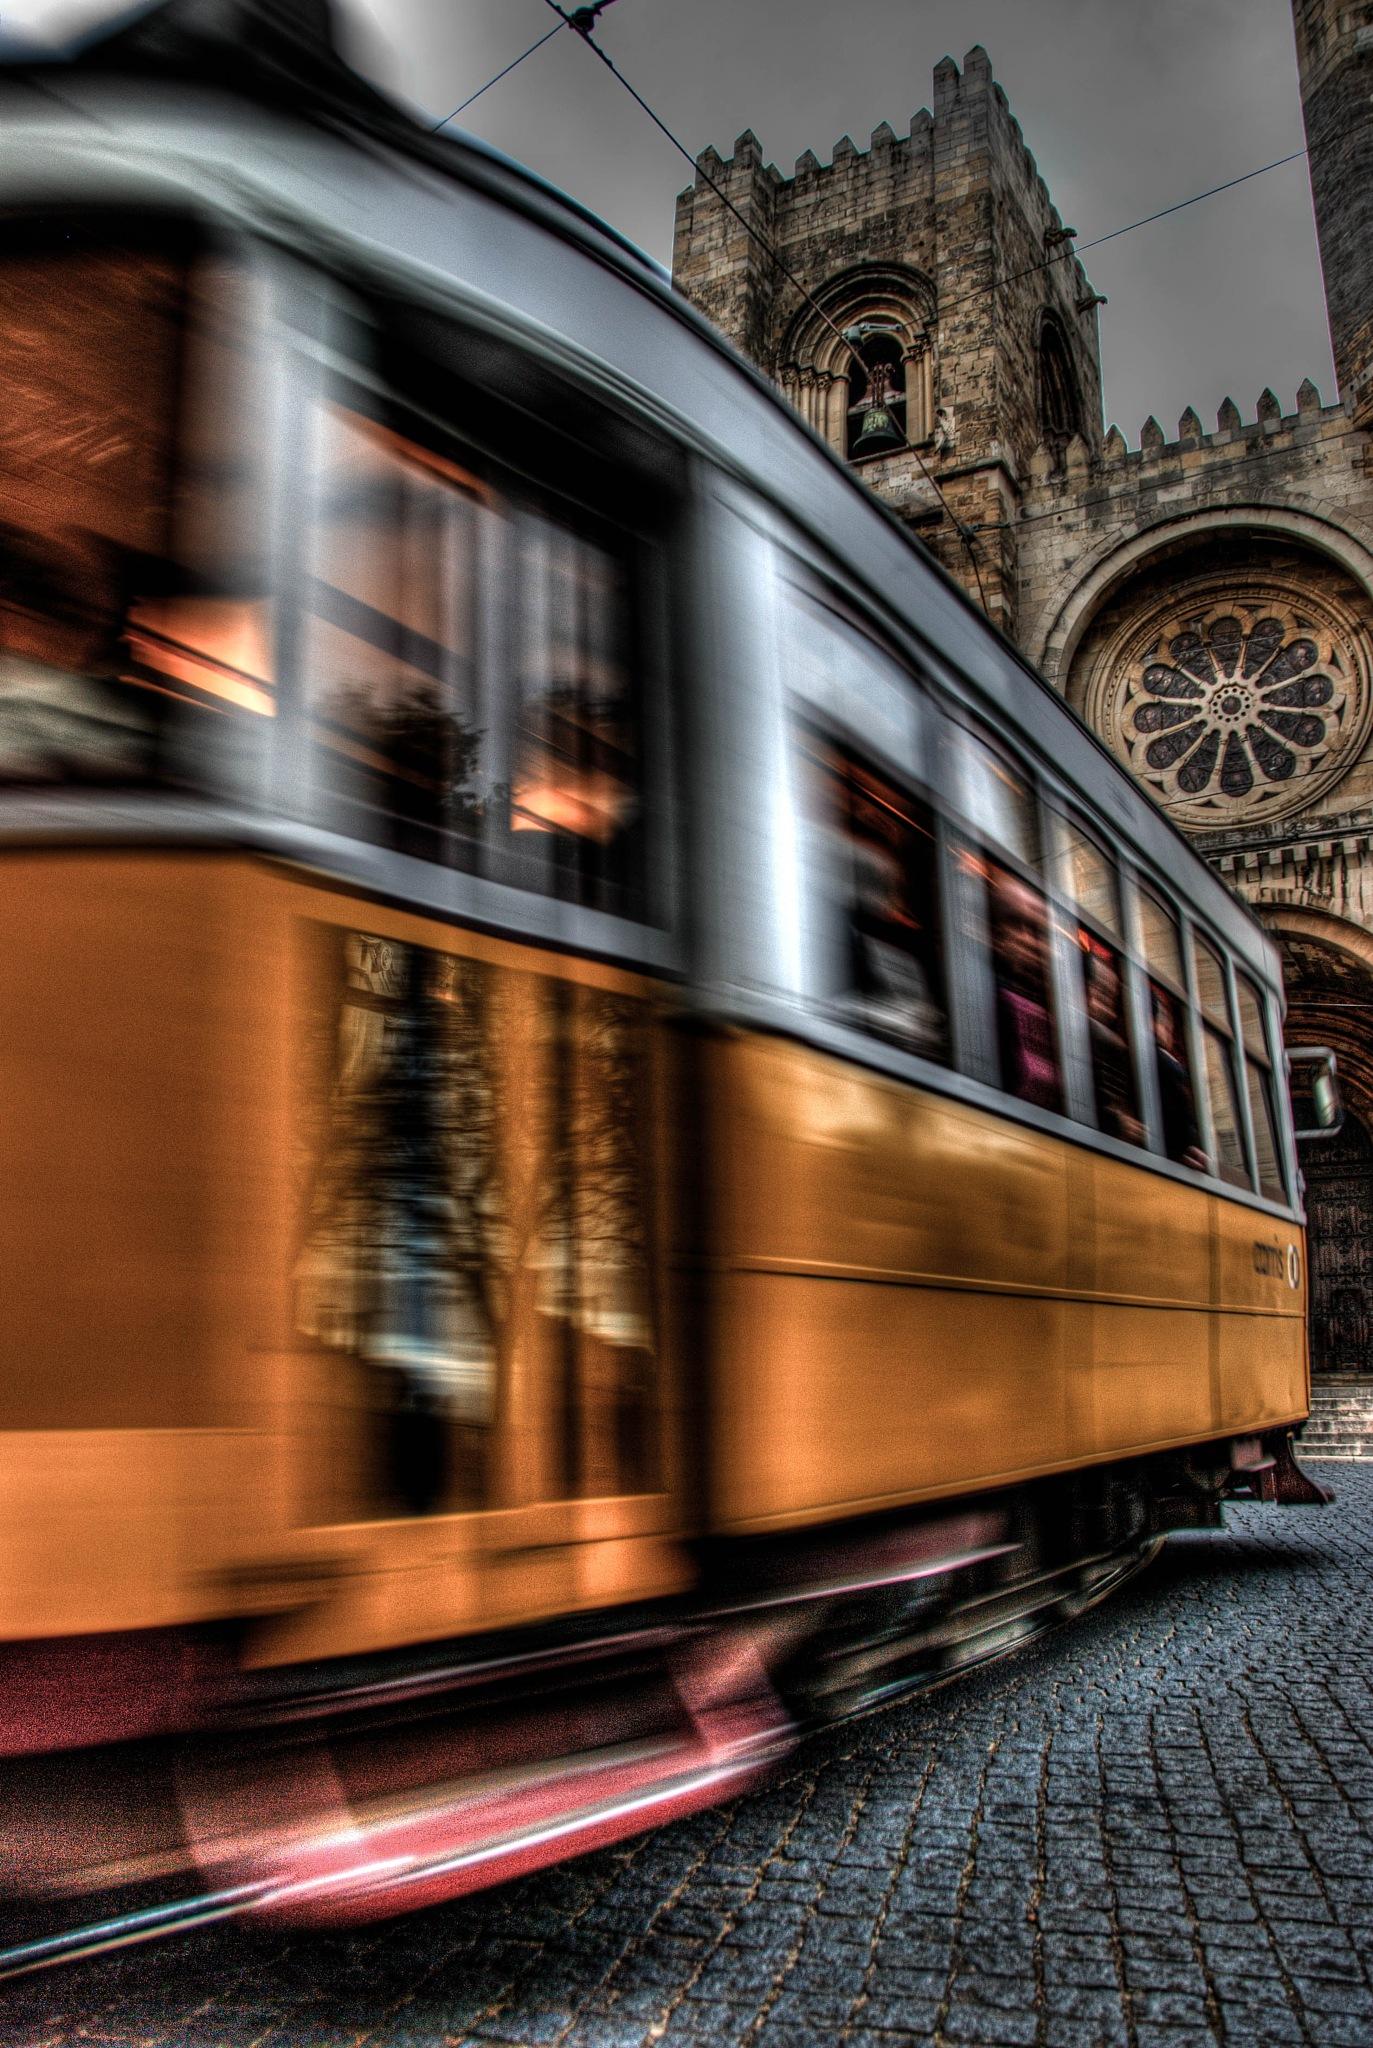 lisbon streetcar by will.vossenberg